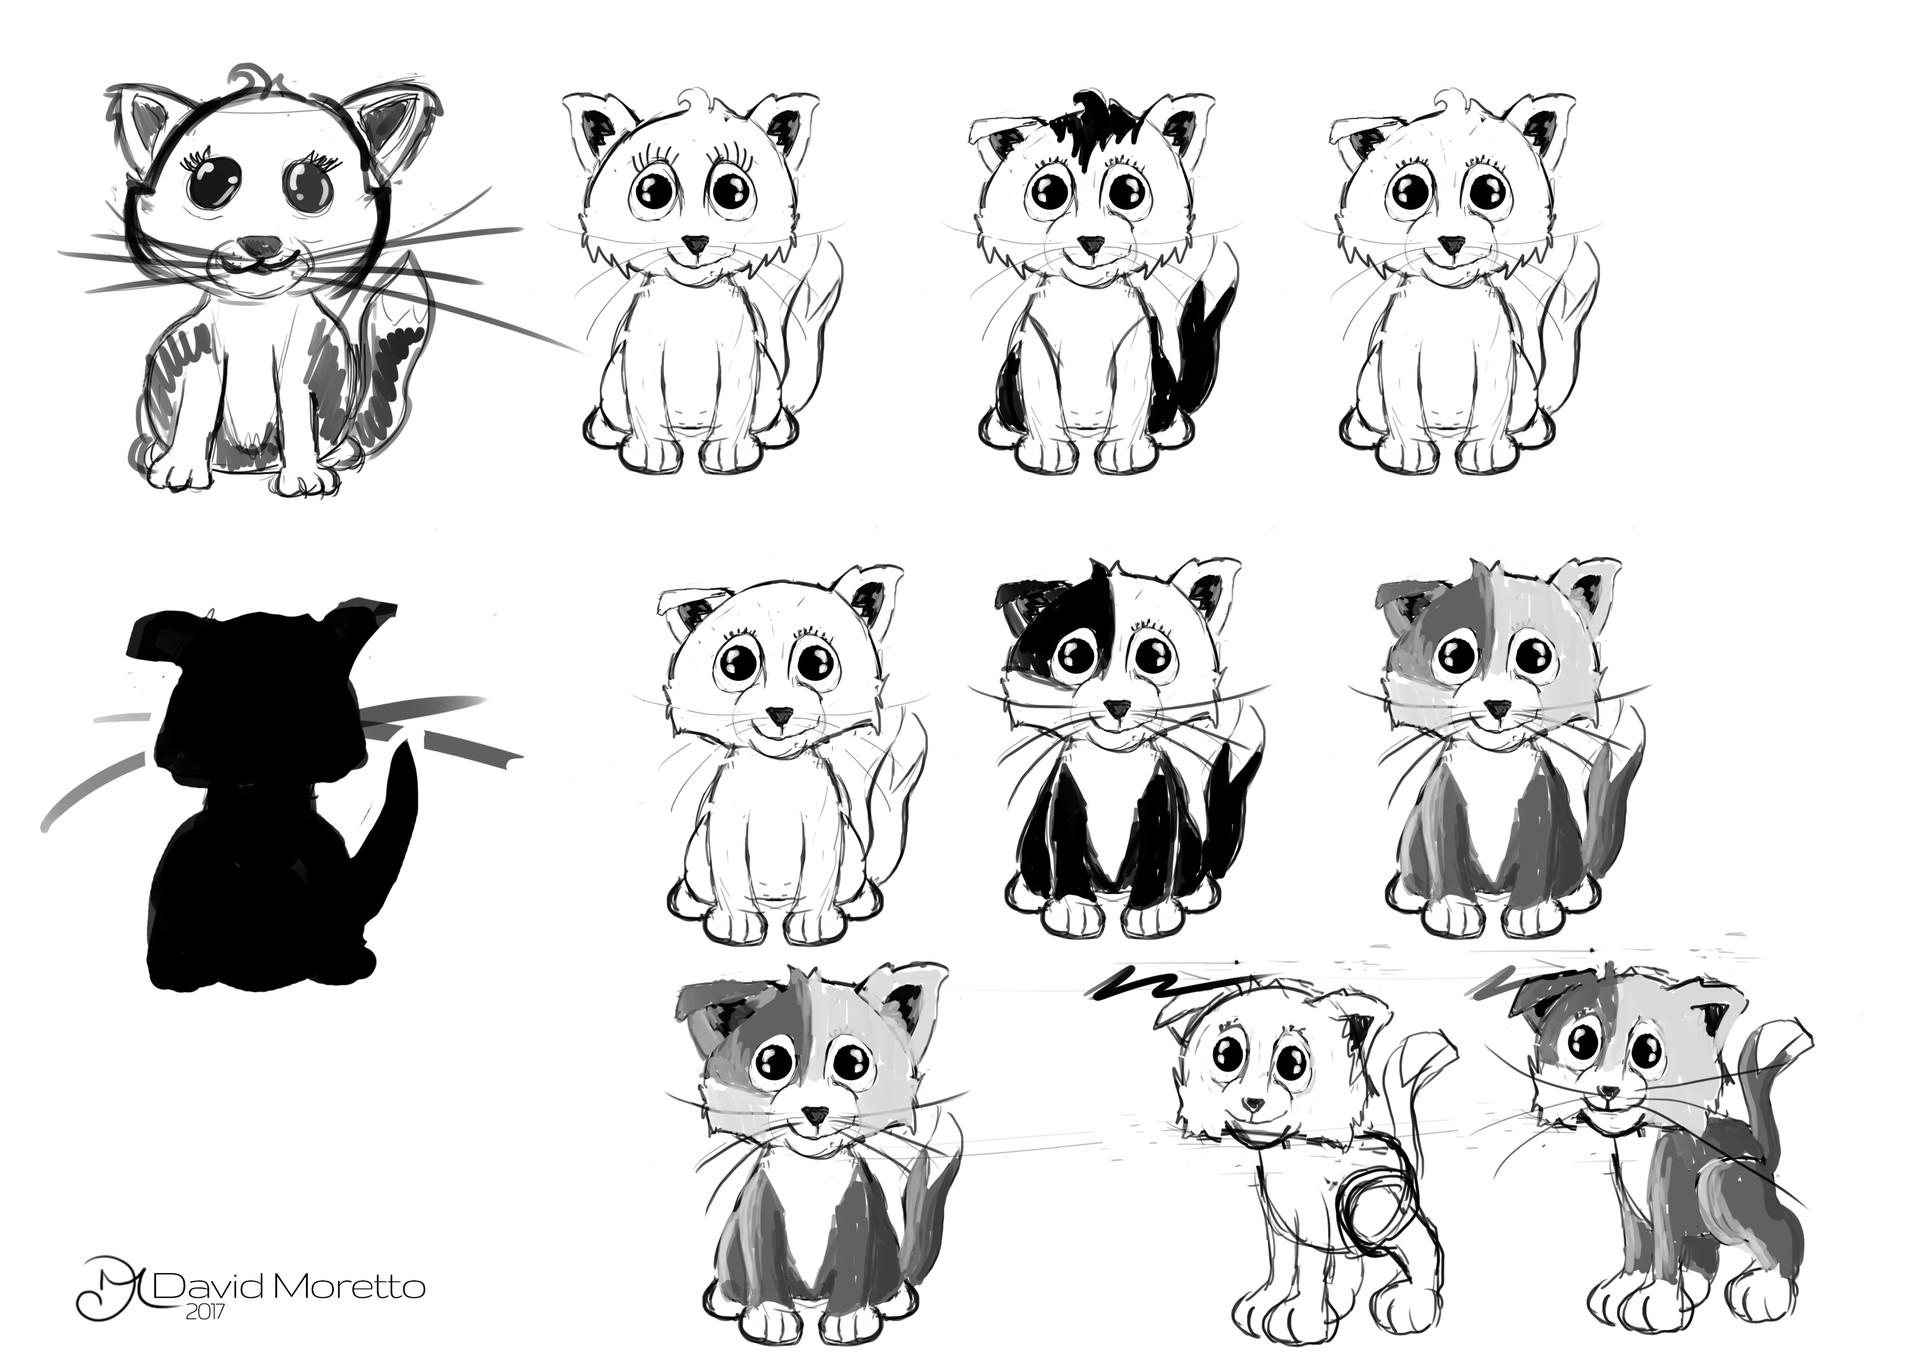 David moretto cat sketch